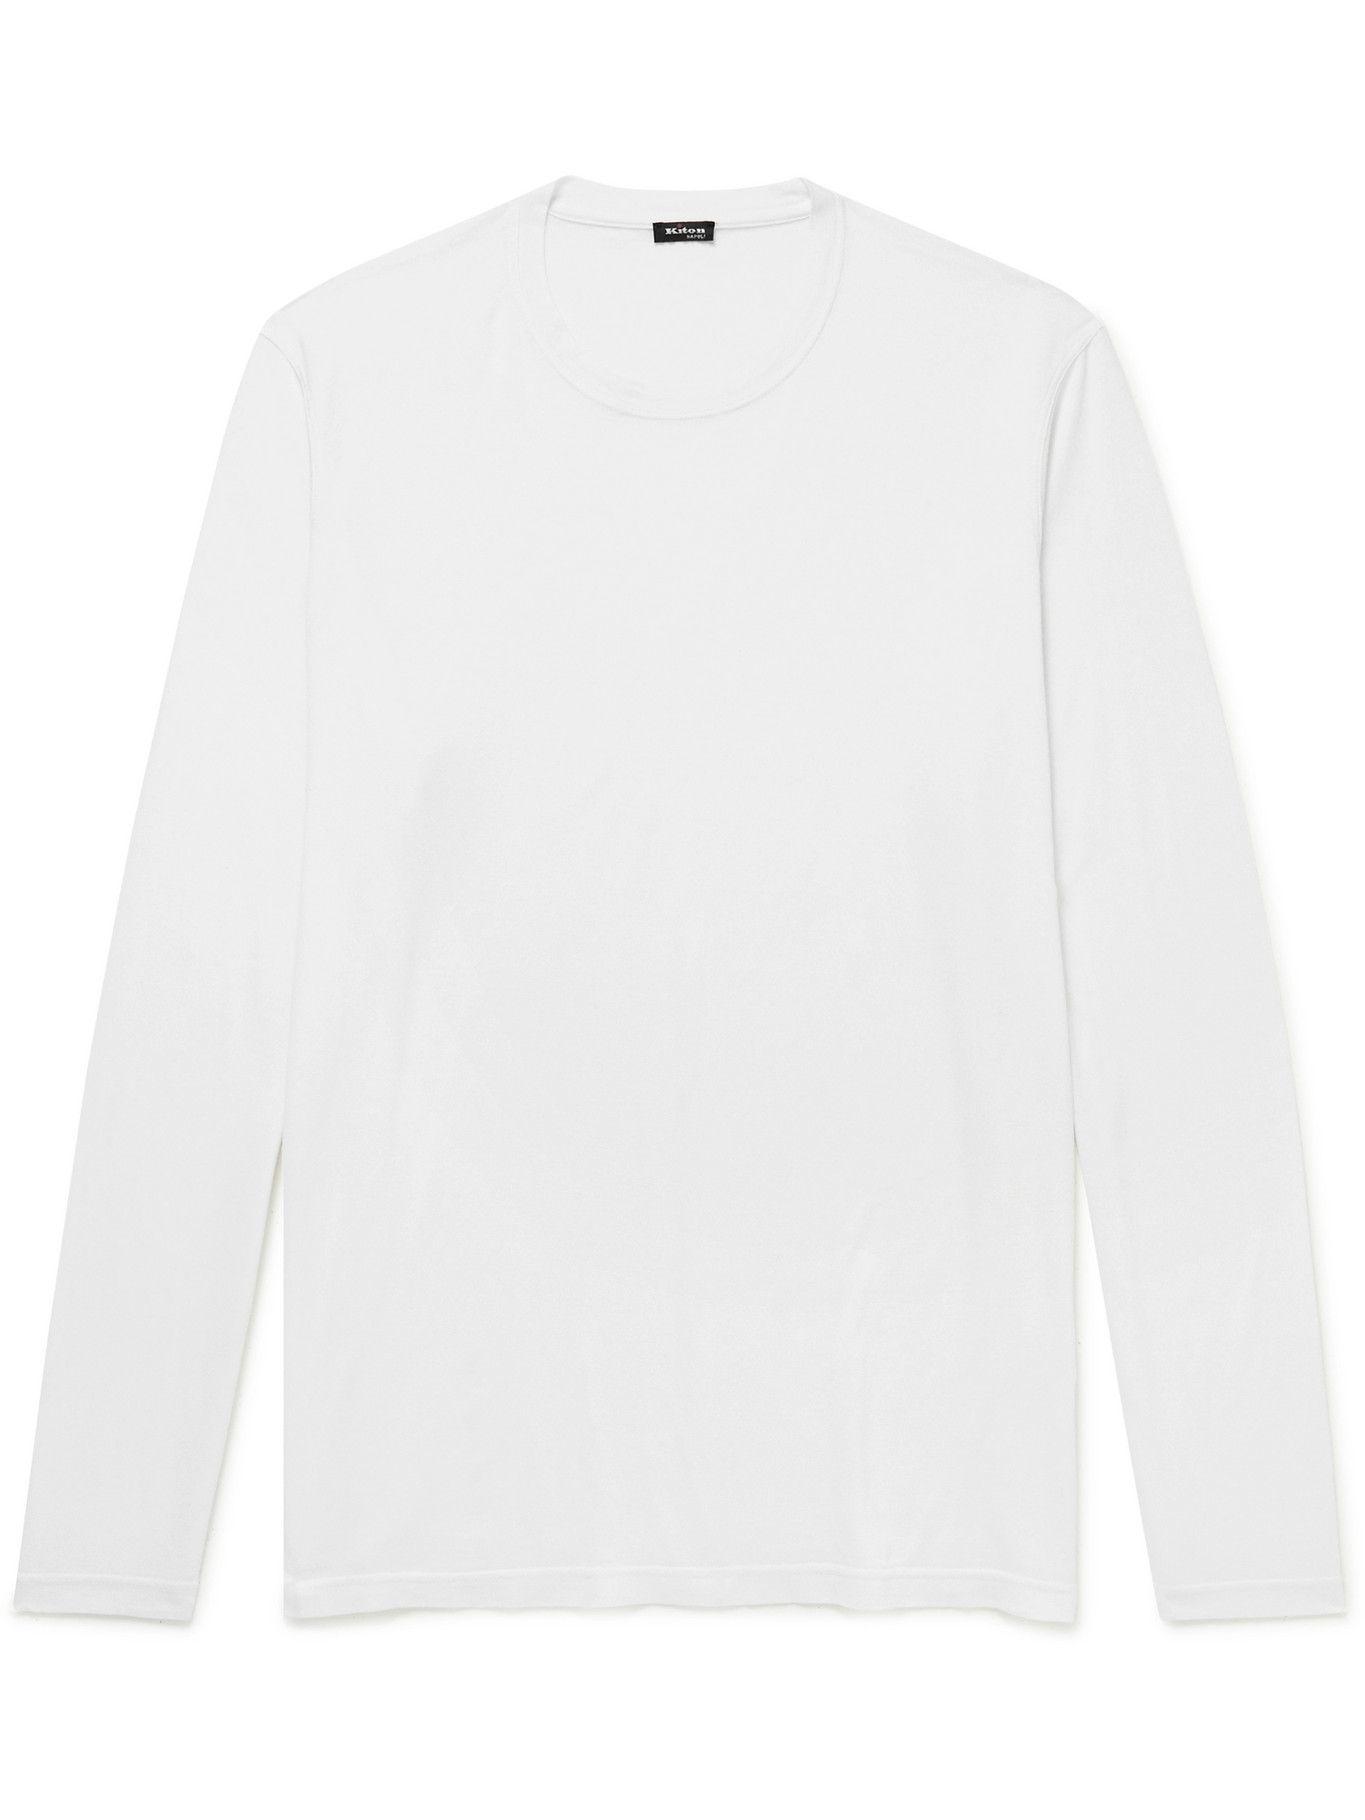 Photo: Kiton - Cotton and Cashmere-Blend Jersey T-Shirt - White